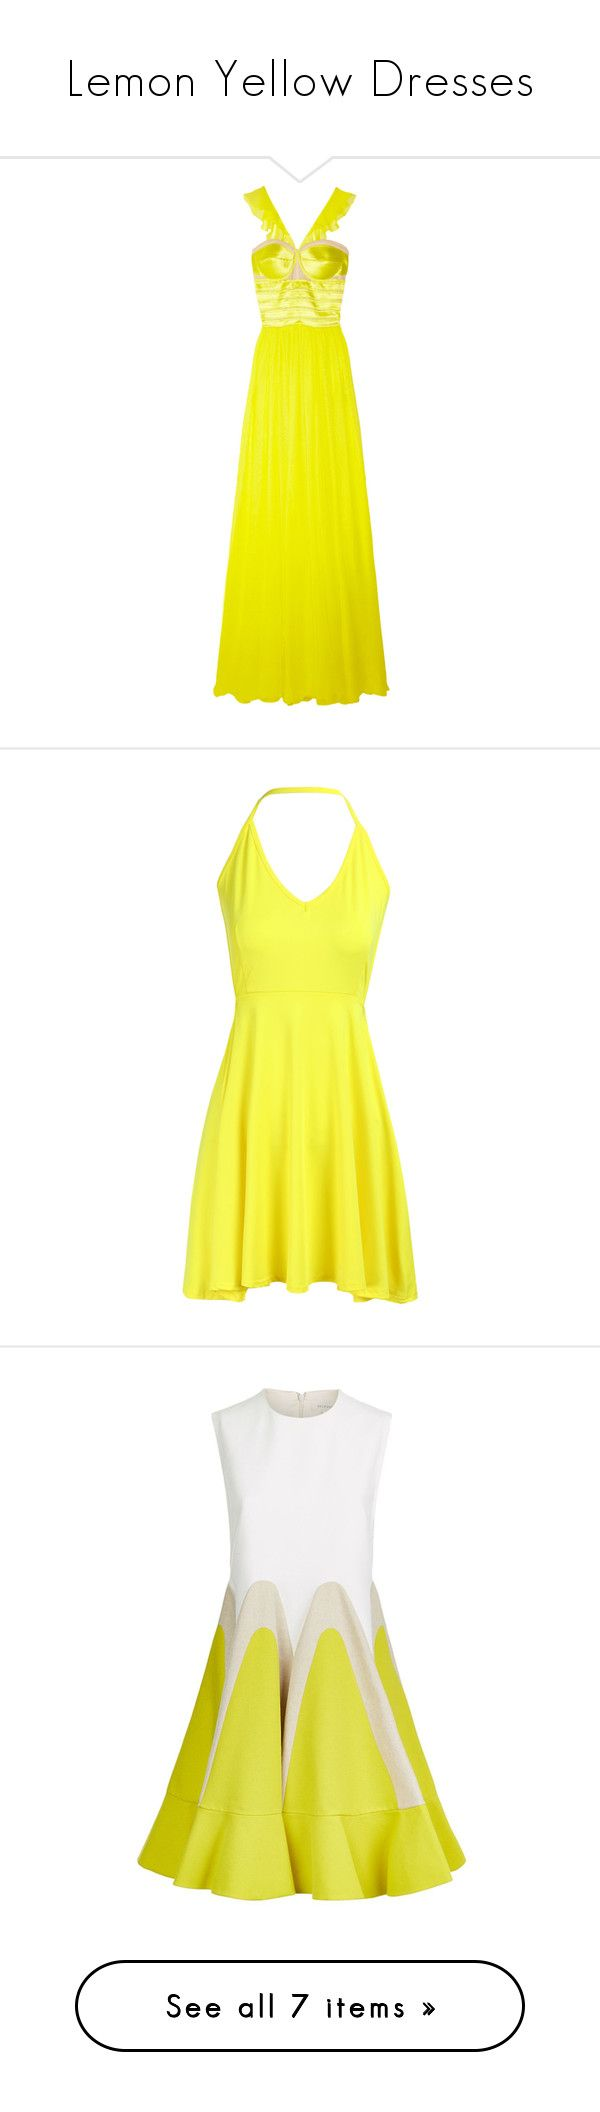 """Lemon Yellow Dresses"" by tegan-b-riley on Polyvore featuring dresses, gowns, satin corset, satin dress, satin evening gown, neon yellow dress, sheer dress, yellow, sexy yellow dress and sexy short cocktail dresses"